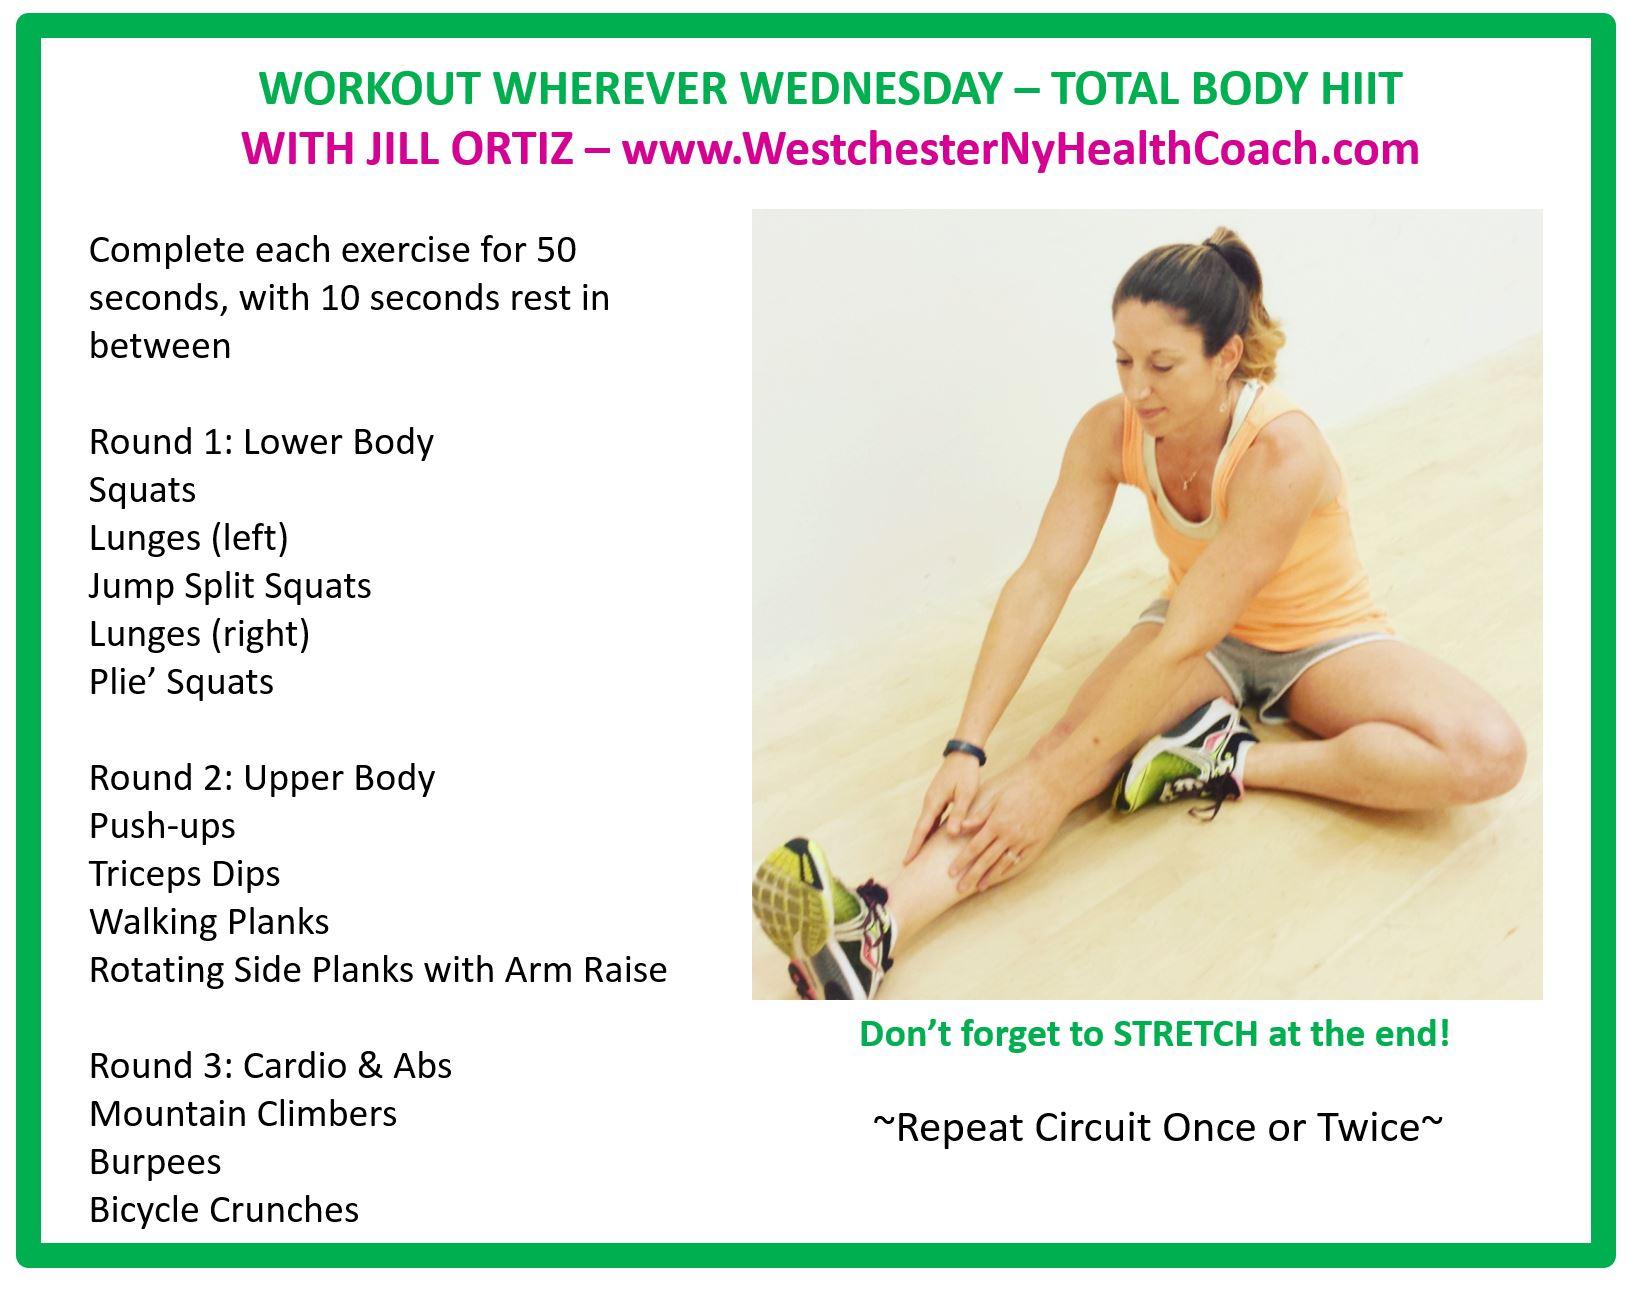 Workout Wherever Wednesday - 10.JPG